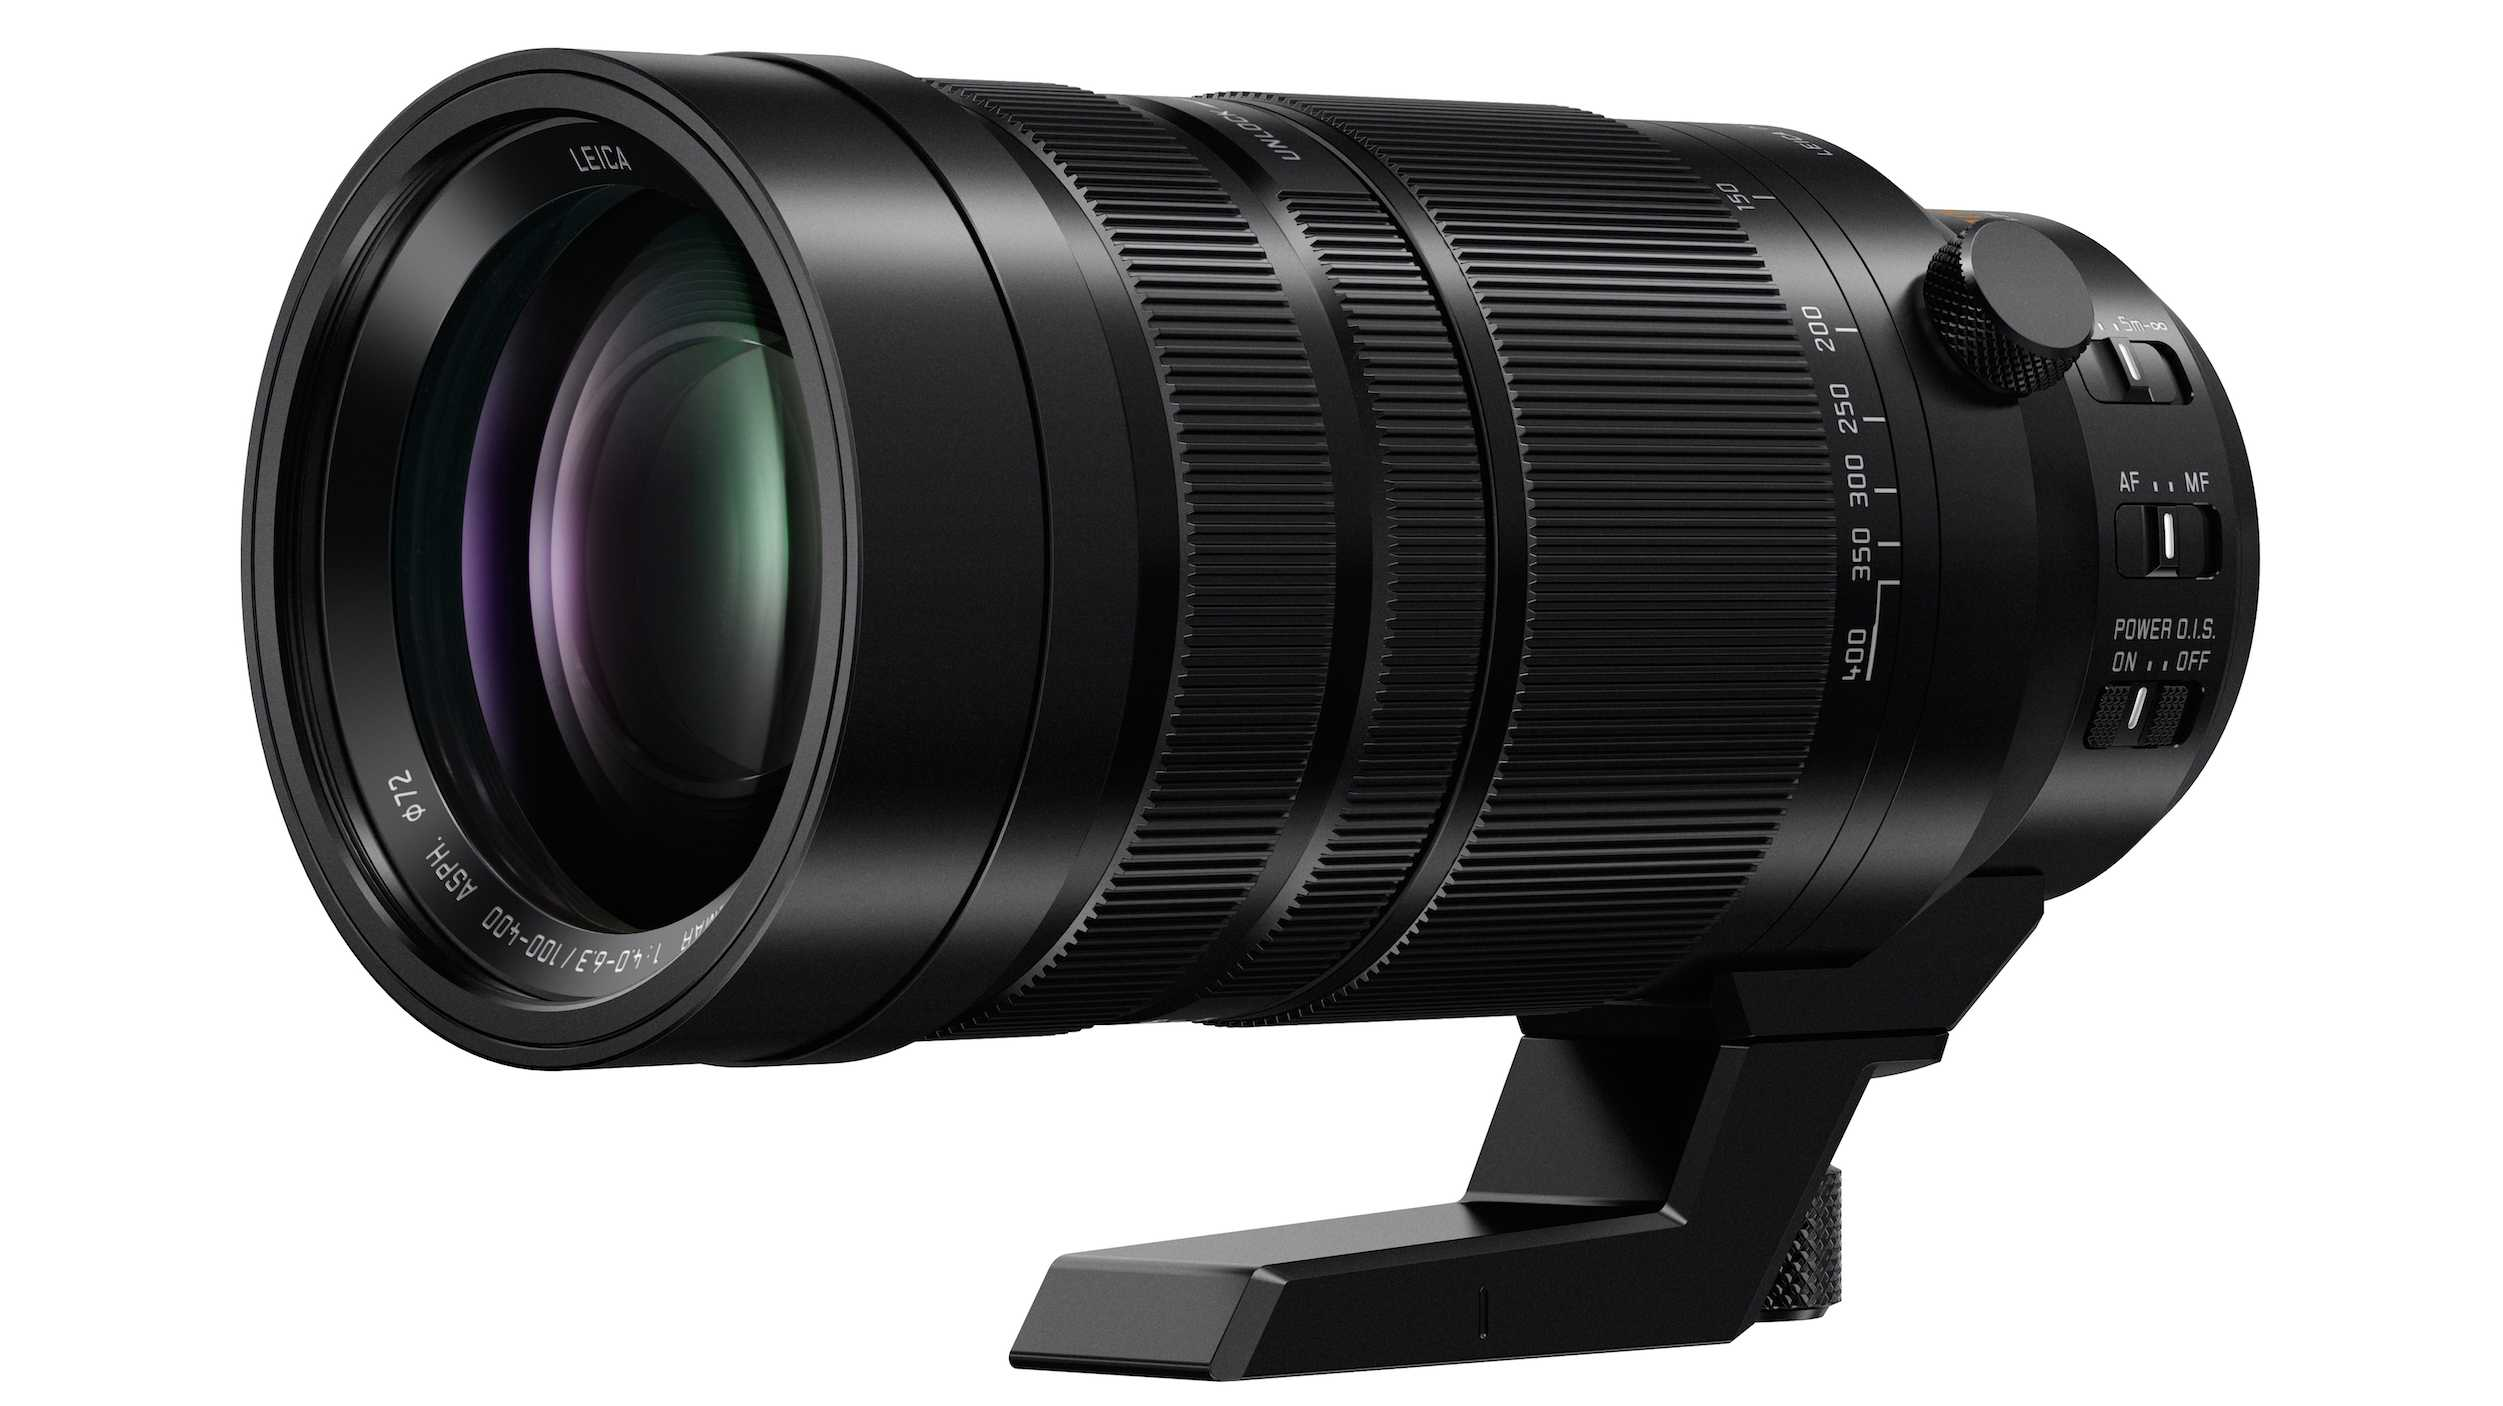 Leica DG Vario-Elmar F4.0-6.3/100-400mm